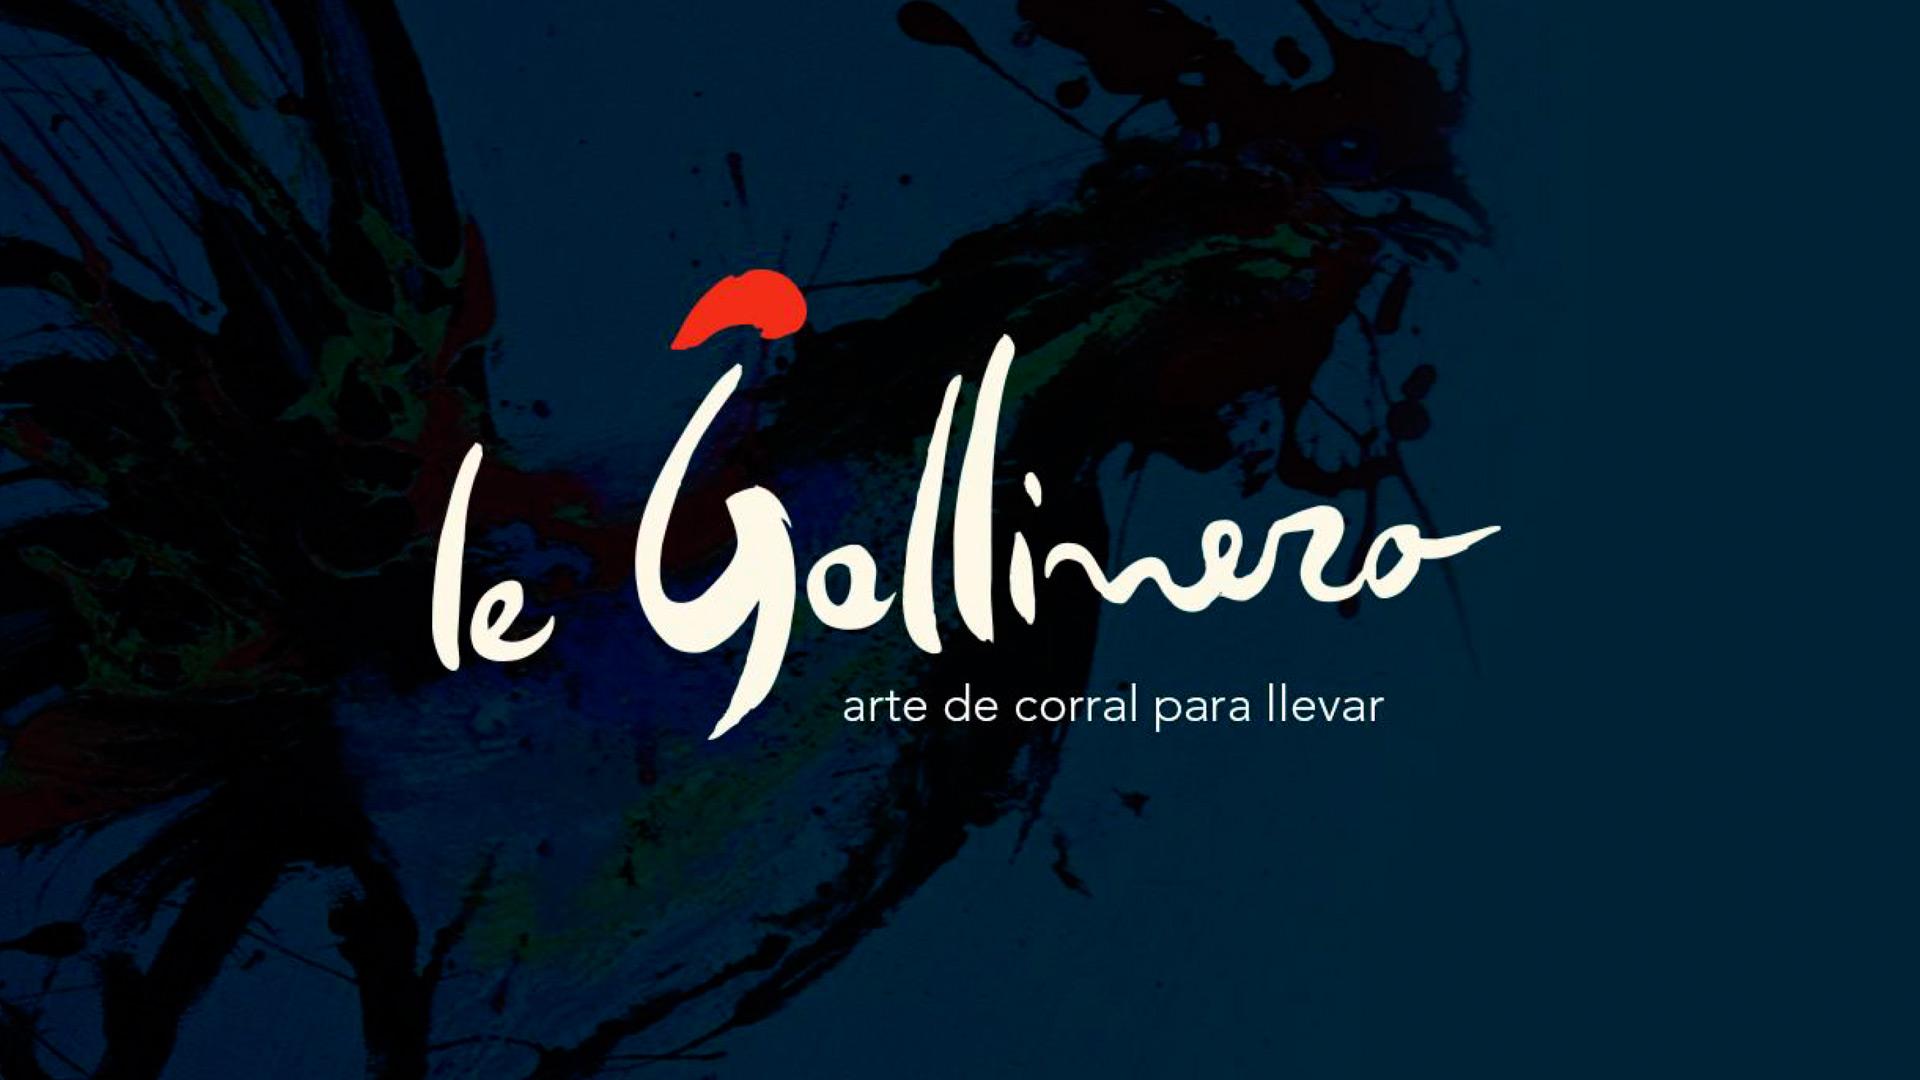 LeGallinero_HR3.jpg